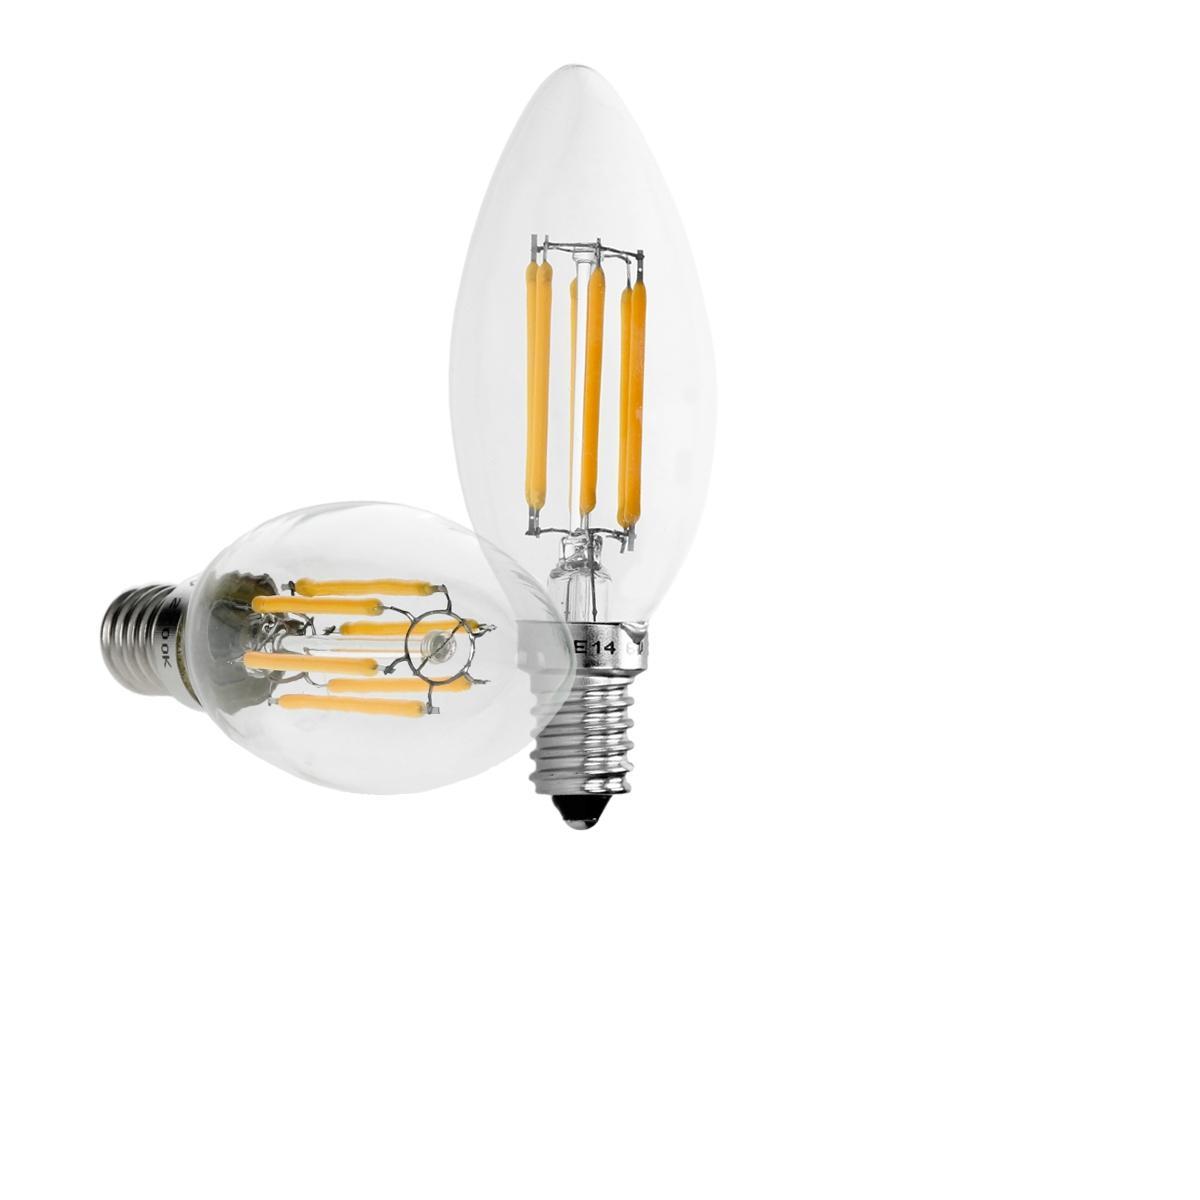 Ecd Germany 4 x lampe LED filament de bougie E14 6W blanc chaud